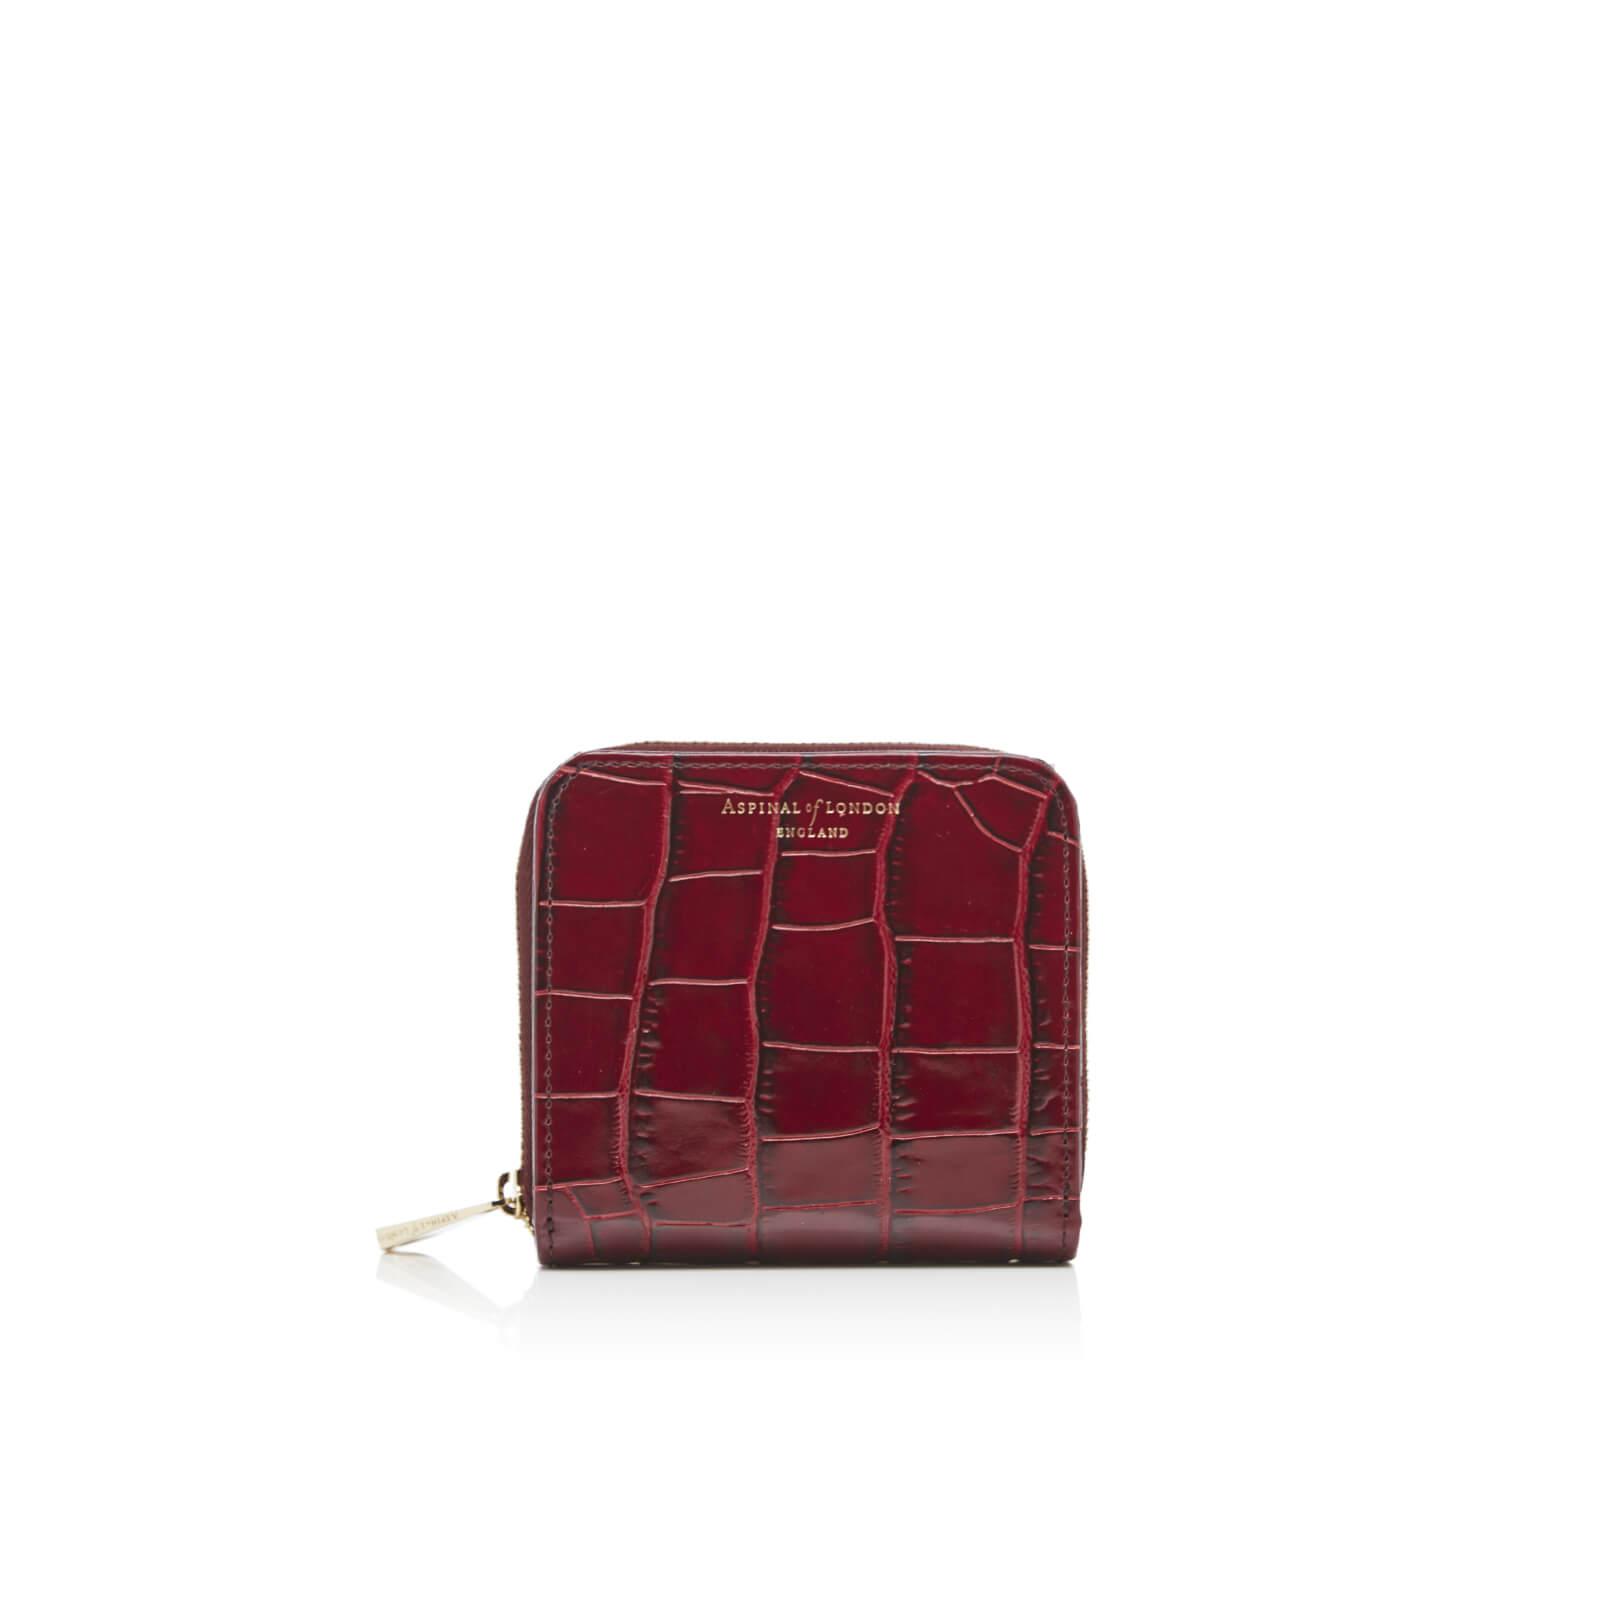 d7cbe3a435ba Aspinal of London Women s Continental Mini Wallet - Bordeaux - Free ...